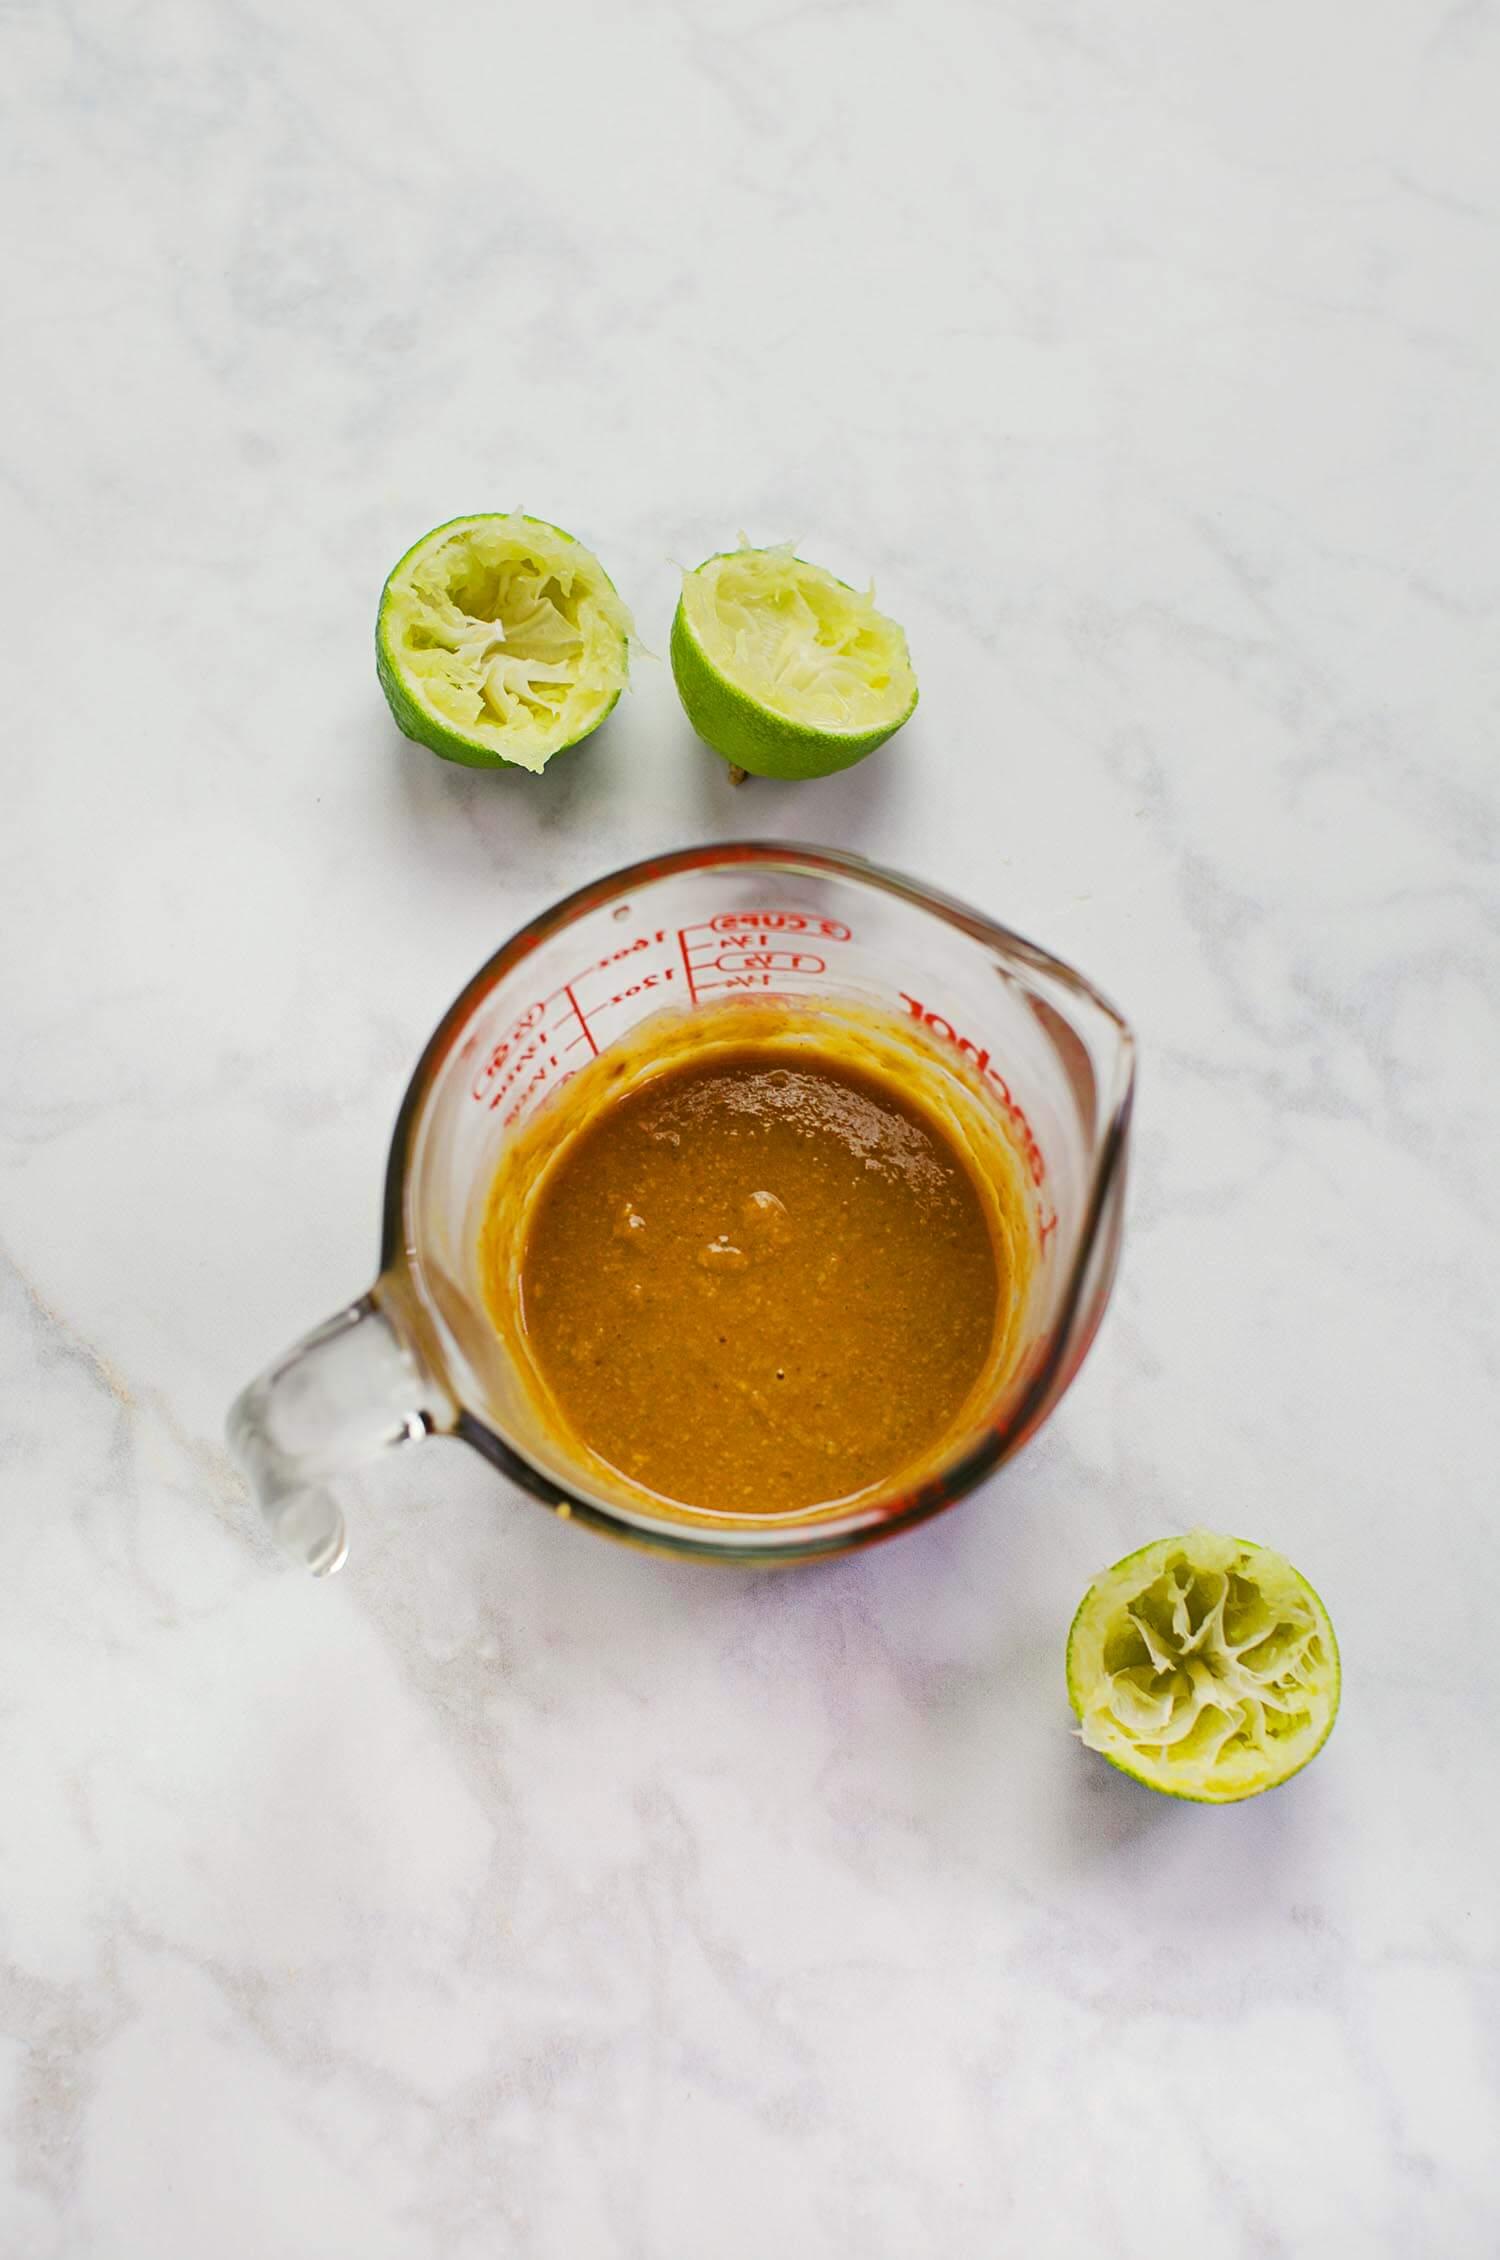 Raw pad thai sauce